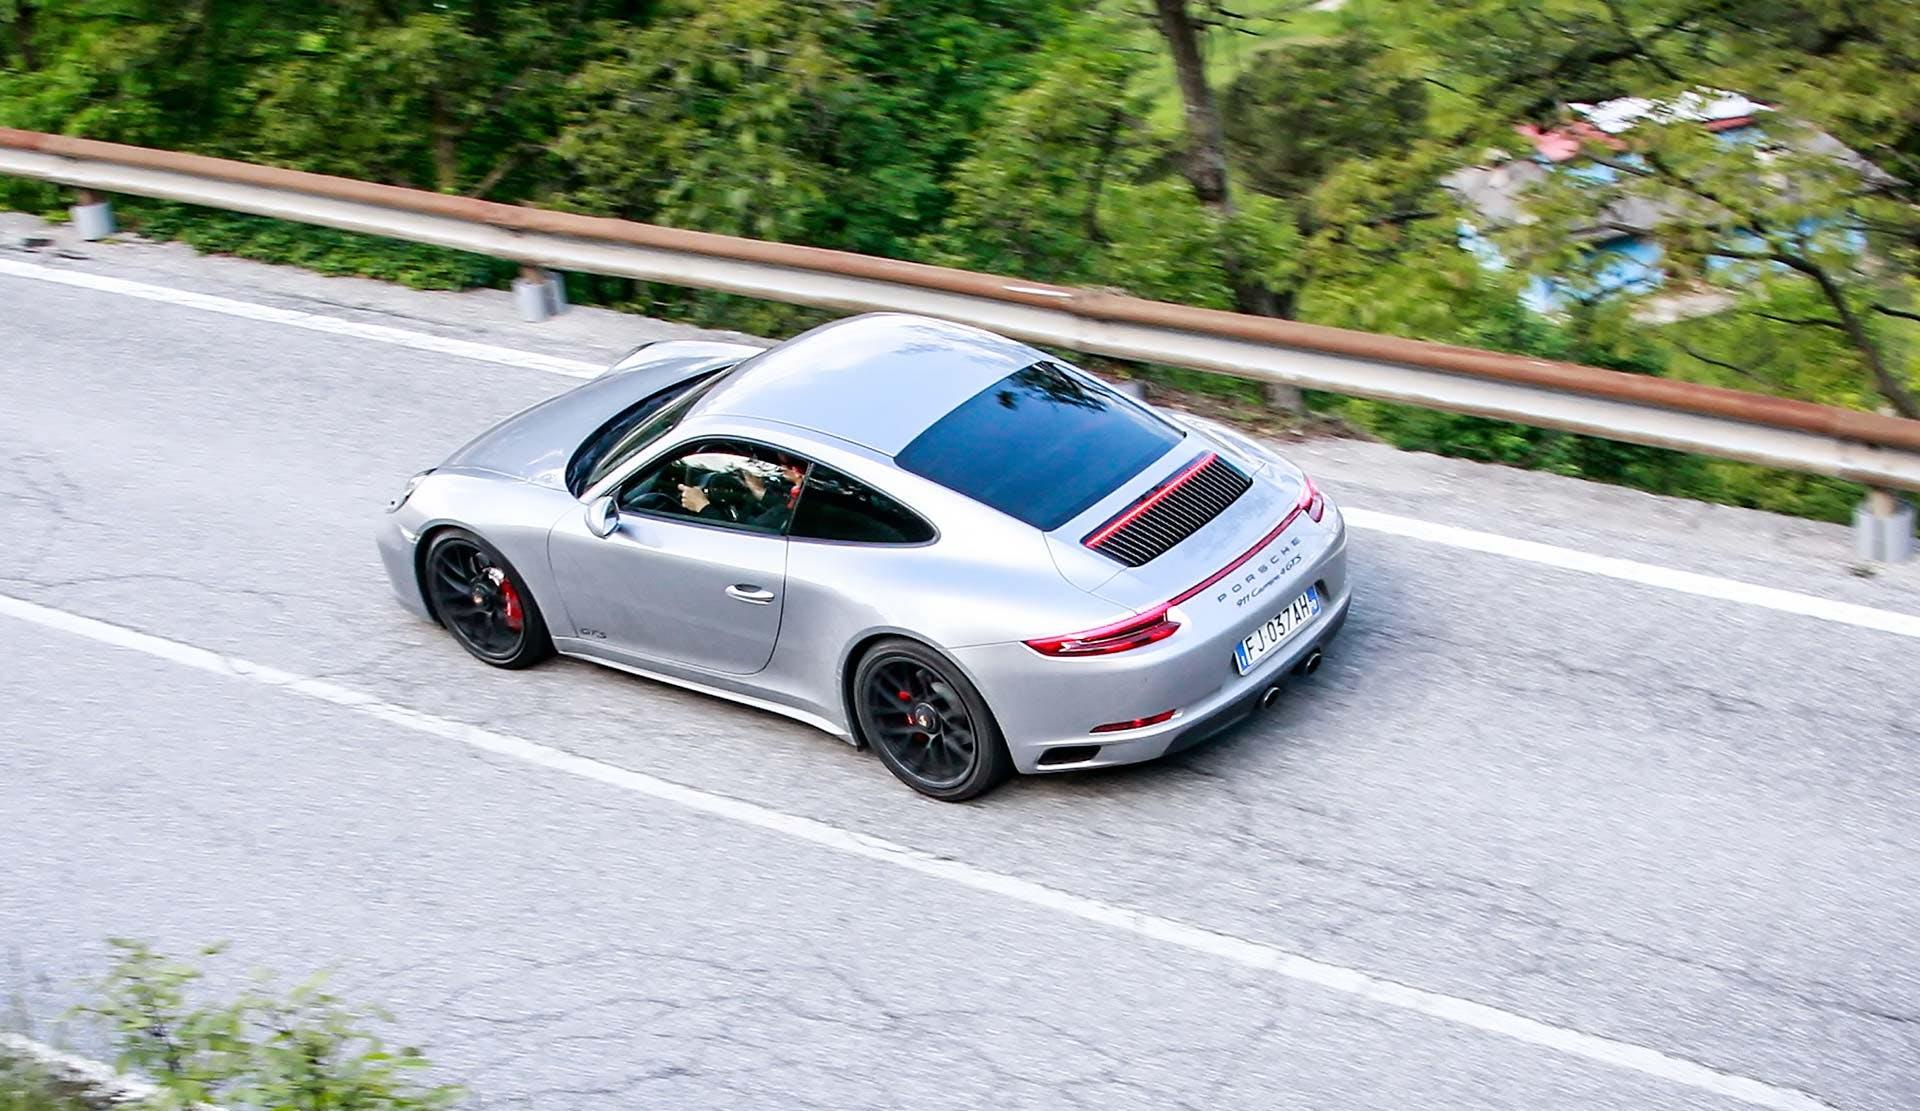 Porsche 911 GTS Grigia movimento dall'alto